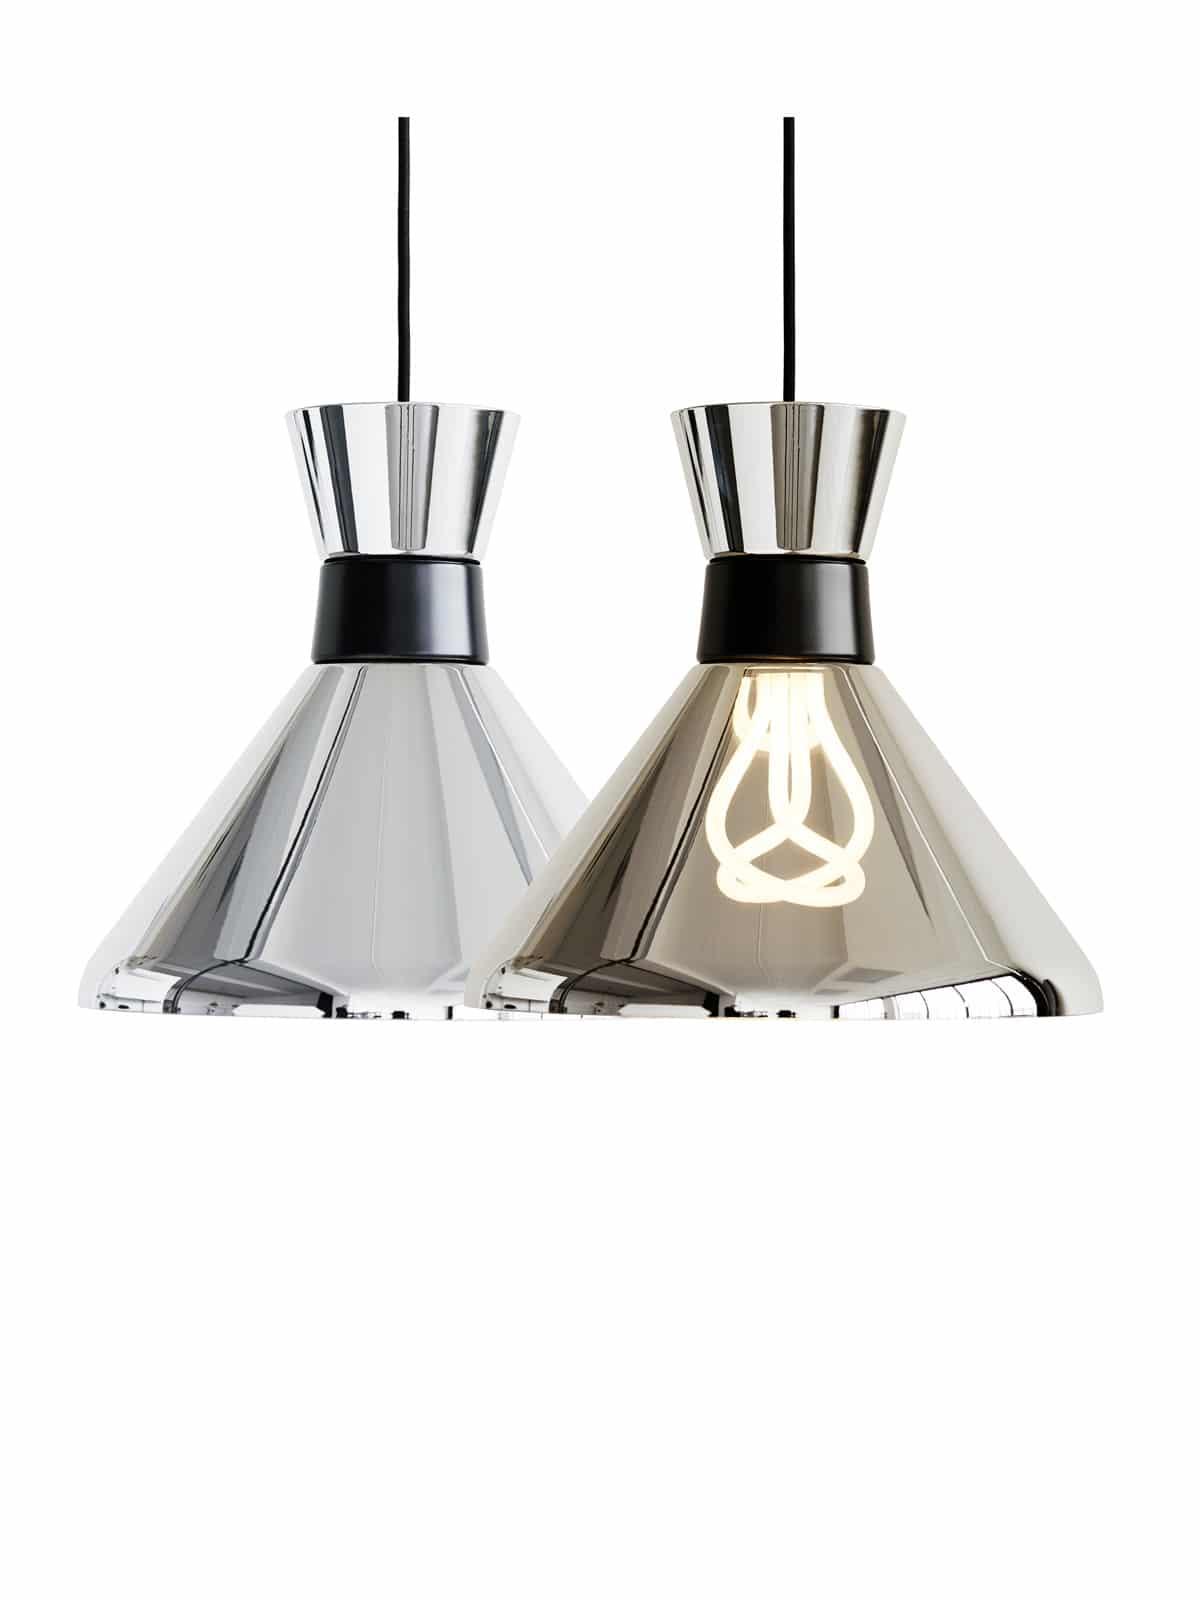 pharaoh angebot lampen leuchten designerleuchten online berlin design. Black Bedroom Furniture Sets. Home Design Ideas